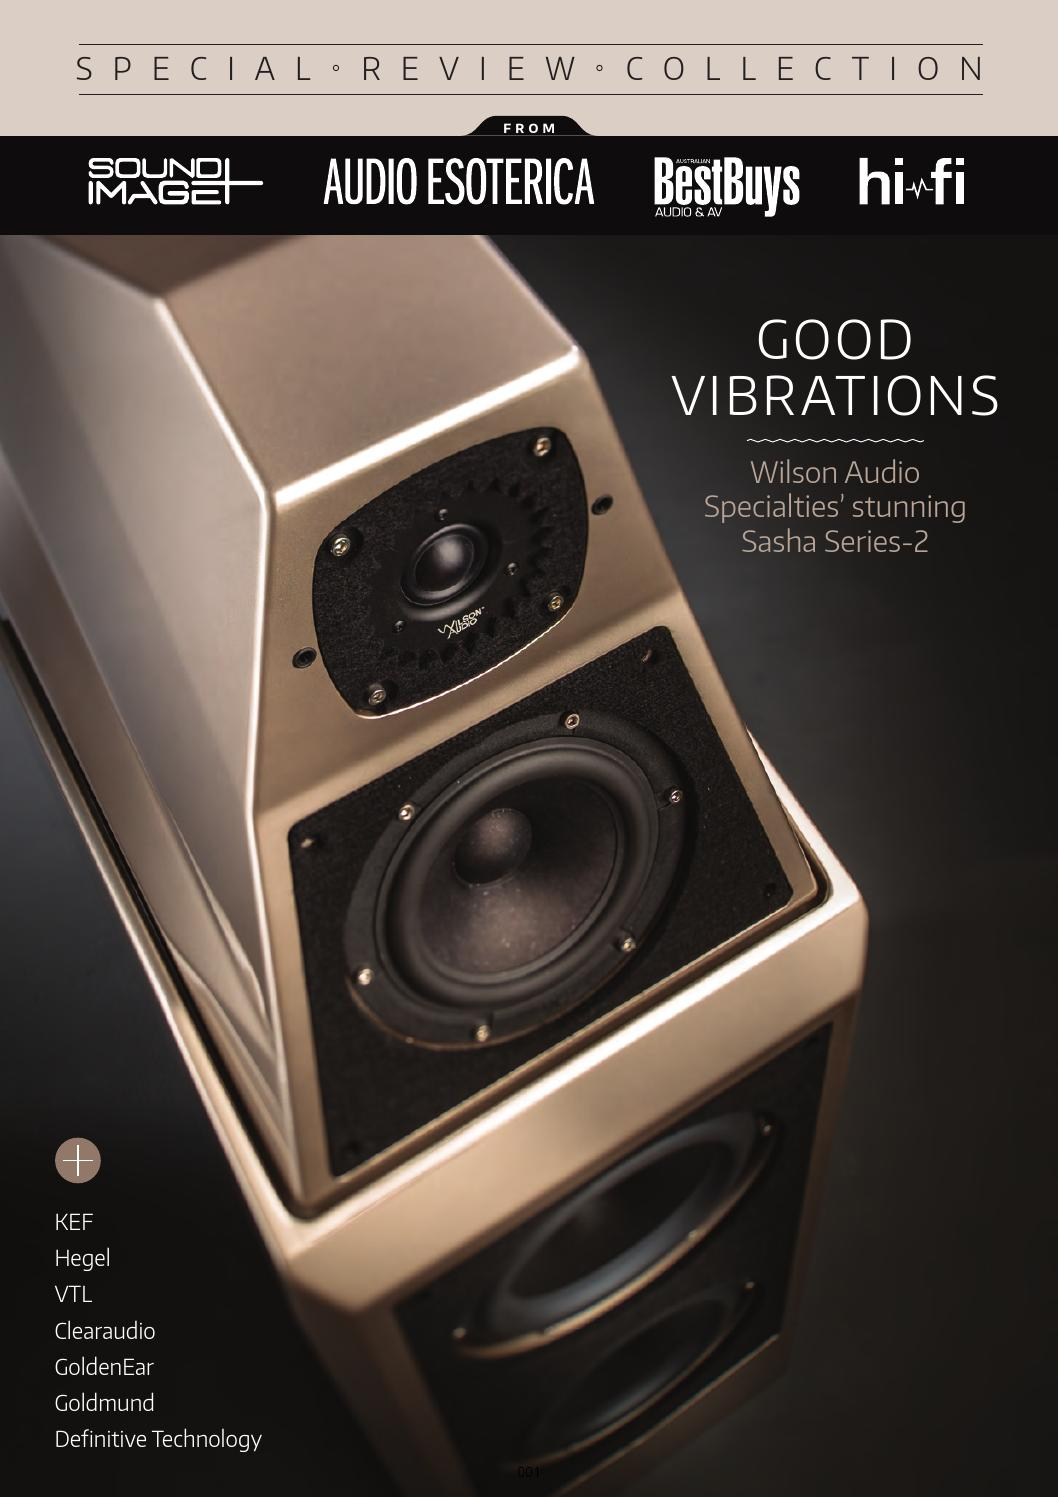 Car Automotive Audio Mini ANL Fuse 80a pack of 5 Platinum Plated IX-ACC-F-104